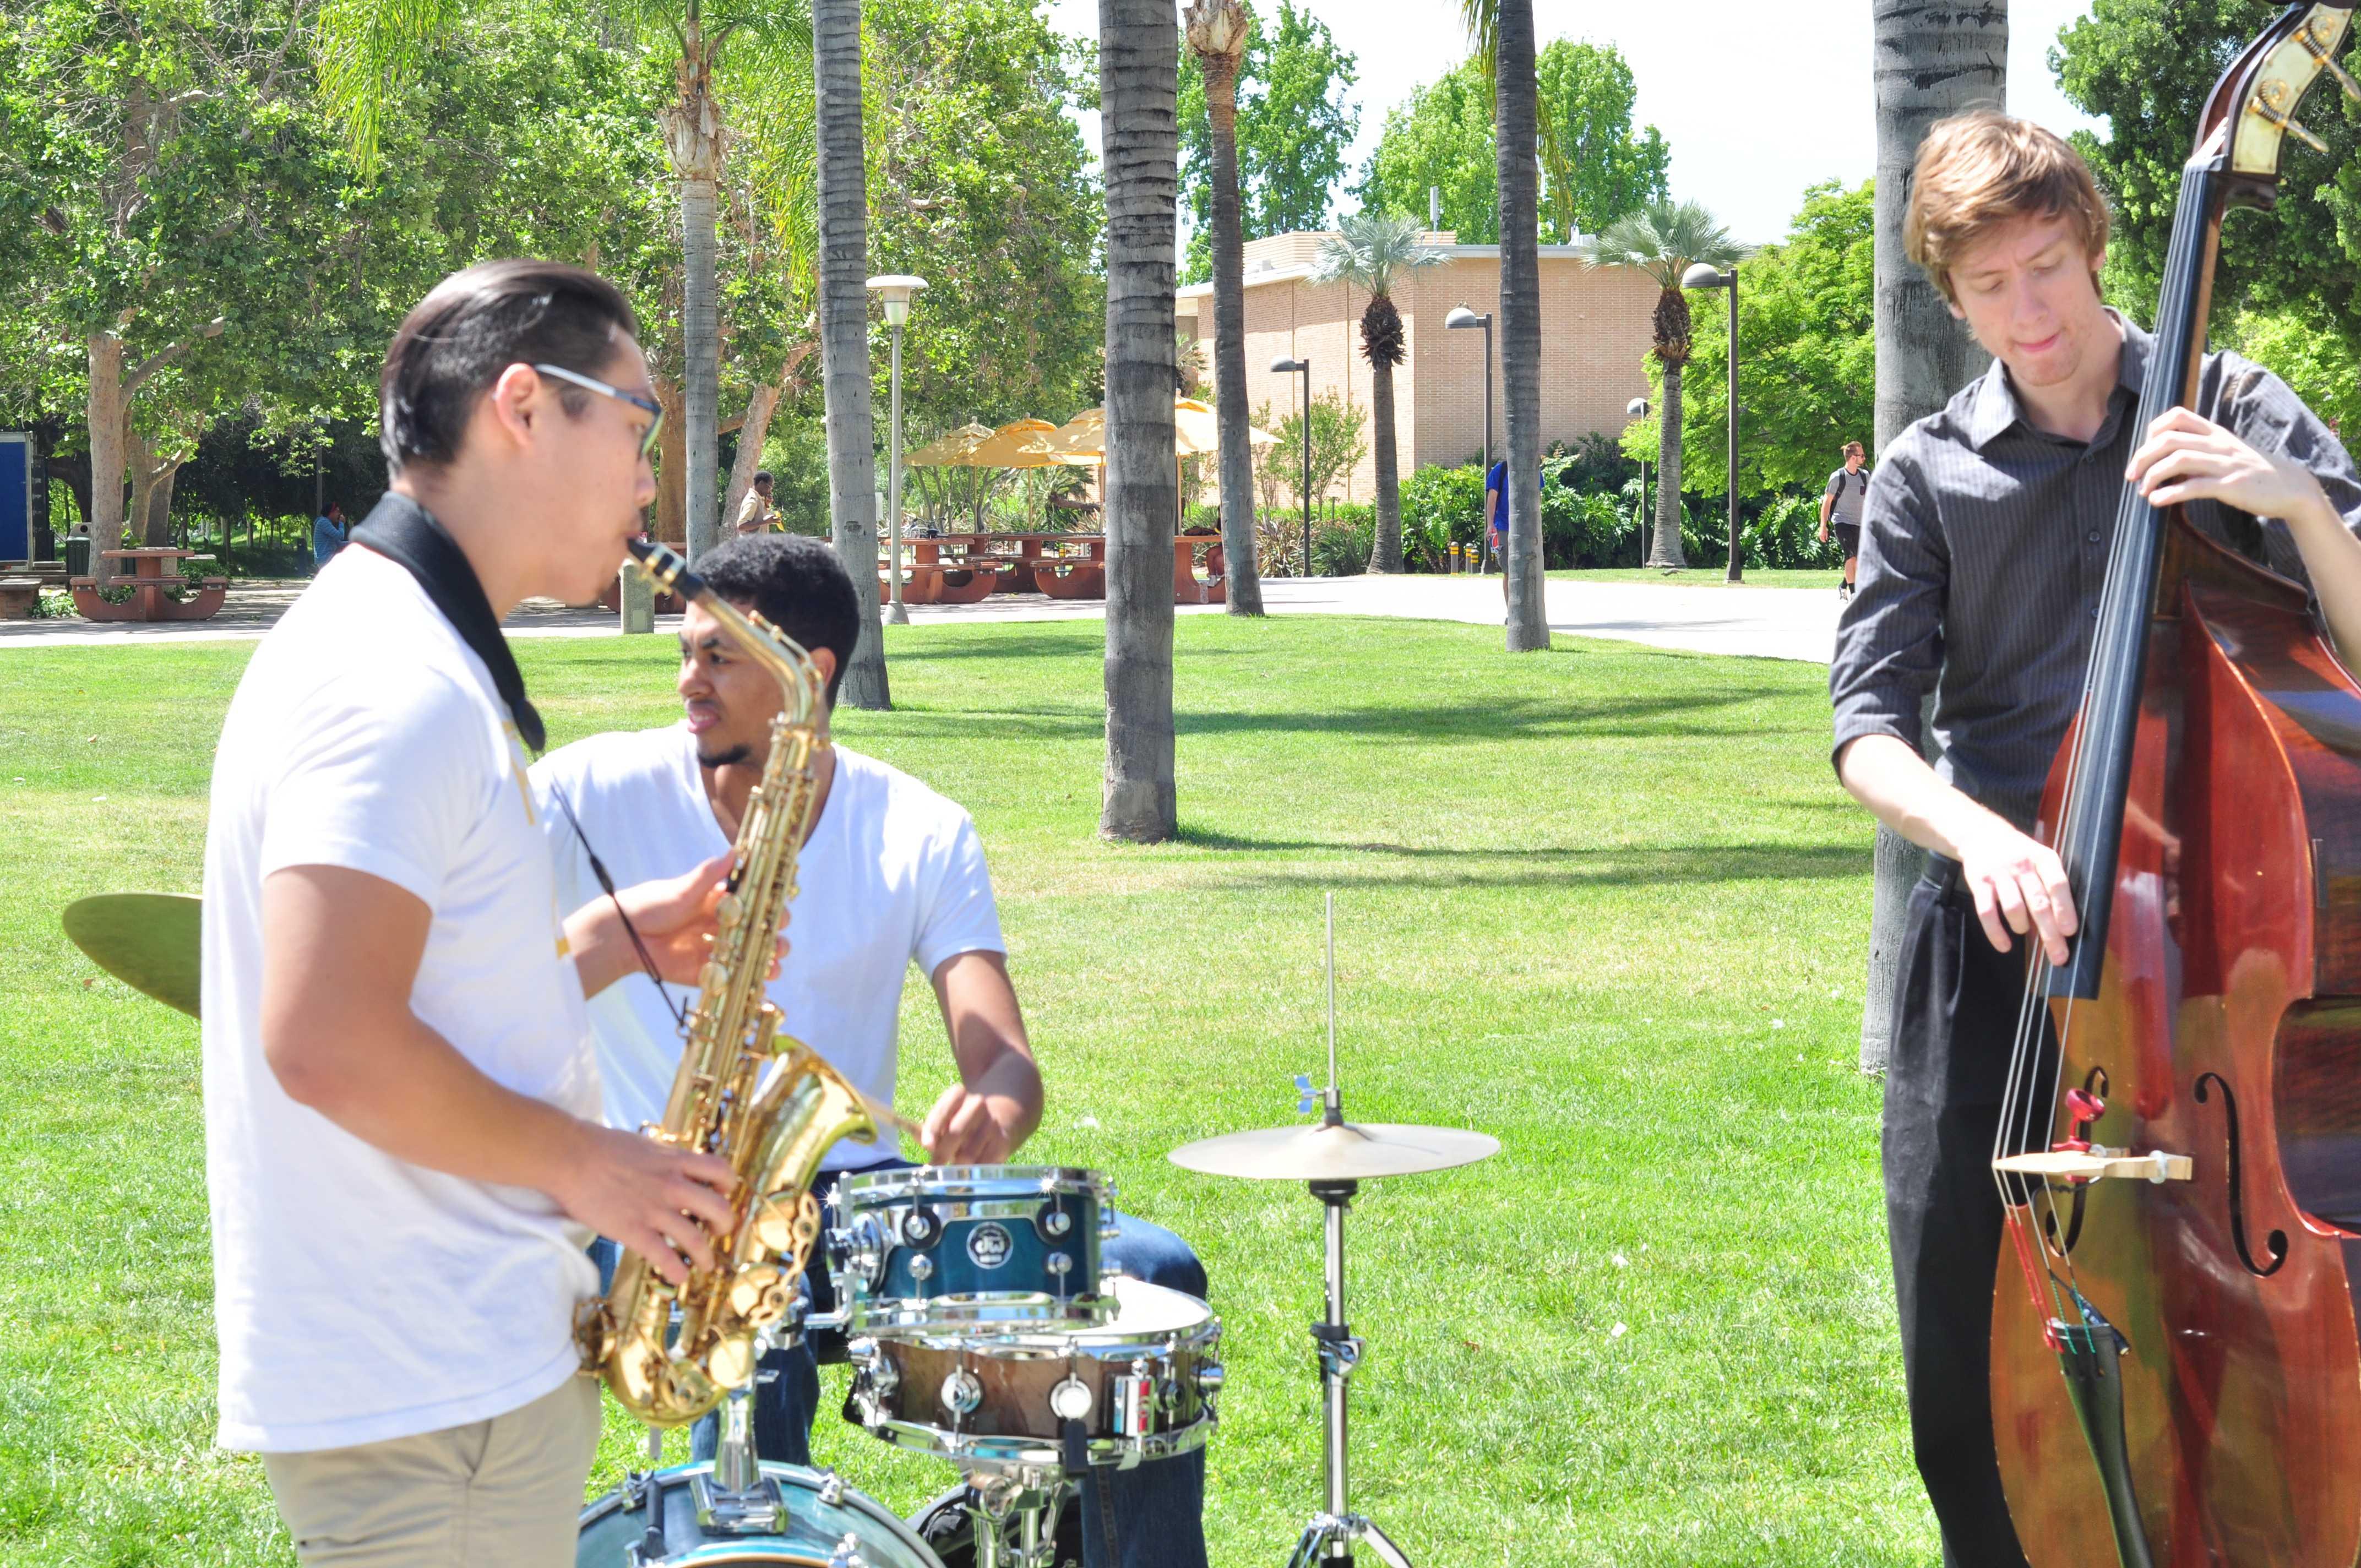 Saxophone: Justin Yun Drums: Matt Jamele Bass: Andy McCauley